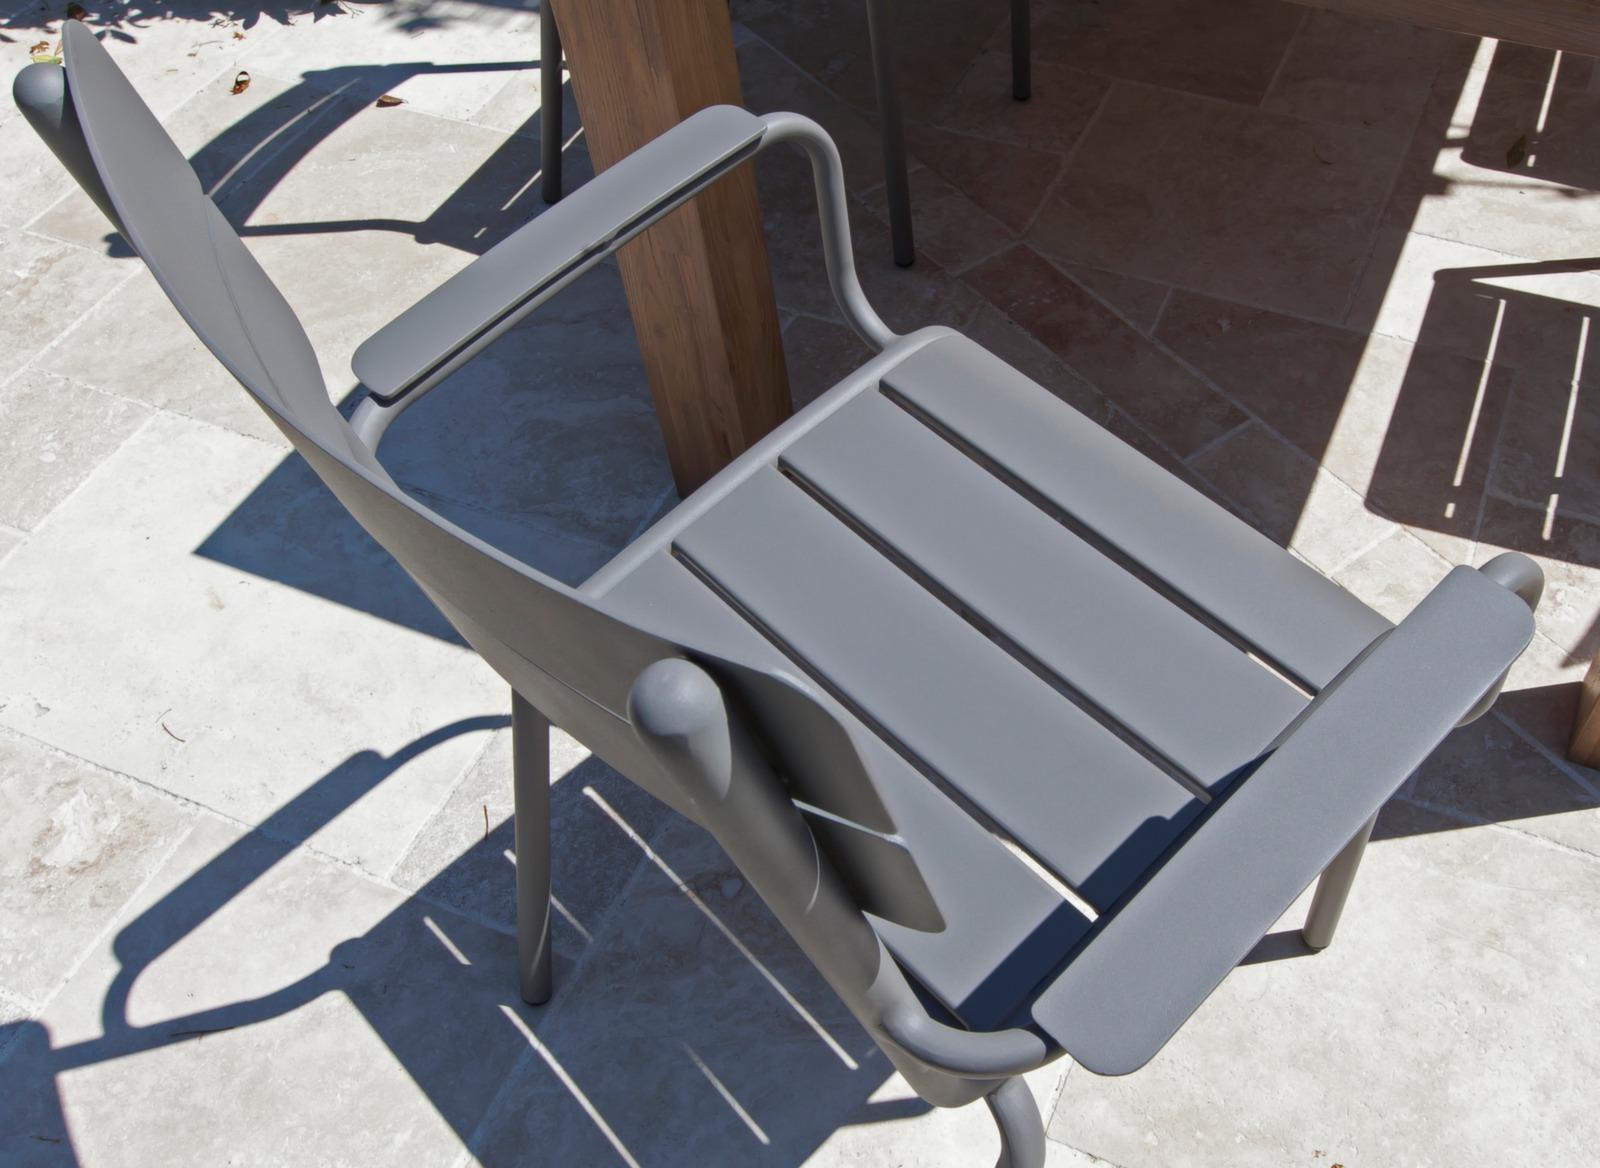 Mobilier En Aluminium Proloisirs Fauteuil Ecole Jardin Style De D9YEbH2eWI